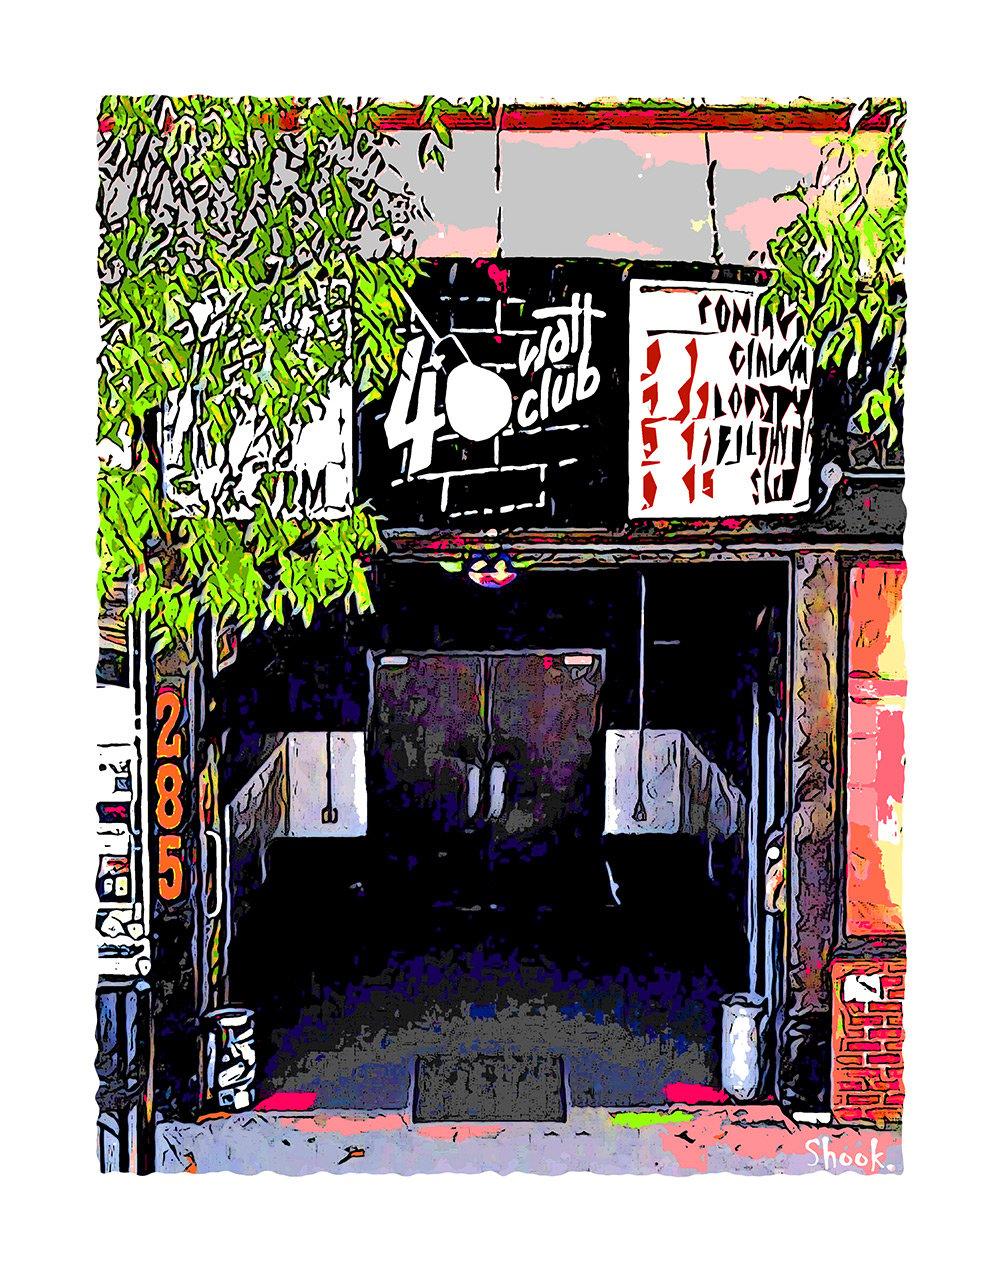 40 Watt Club Athens GA Giclée Art Print (Multi-size options)